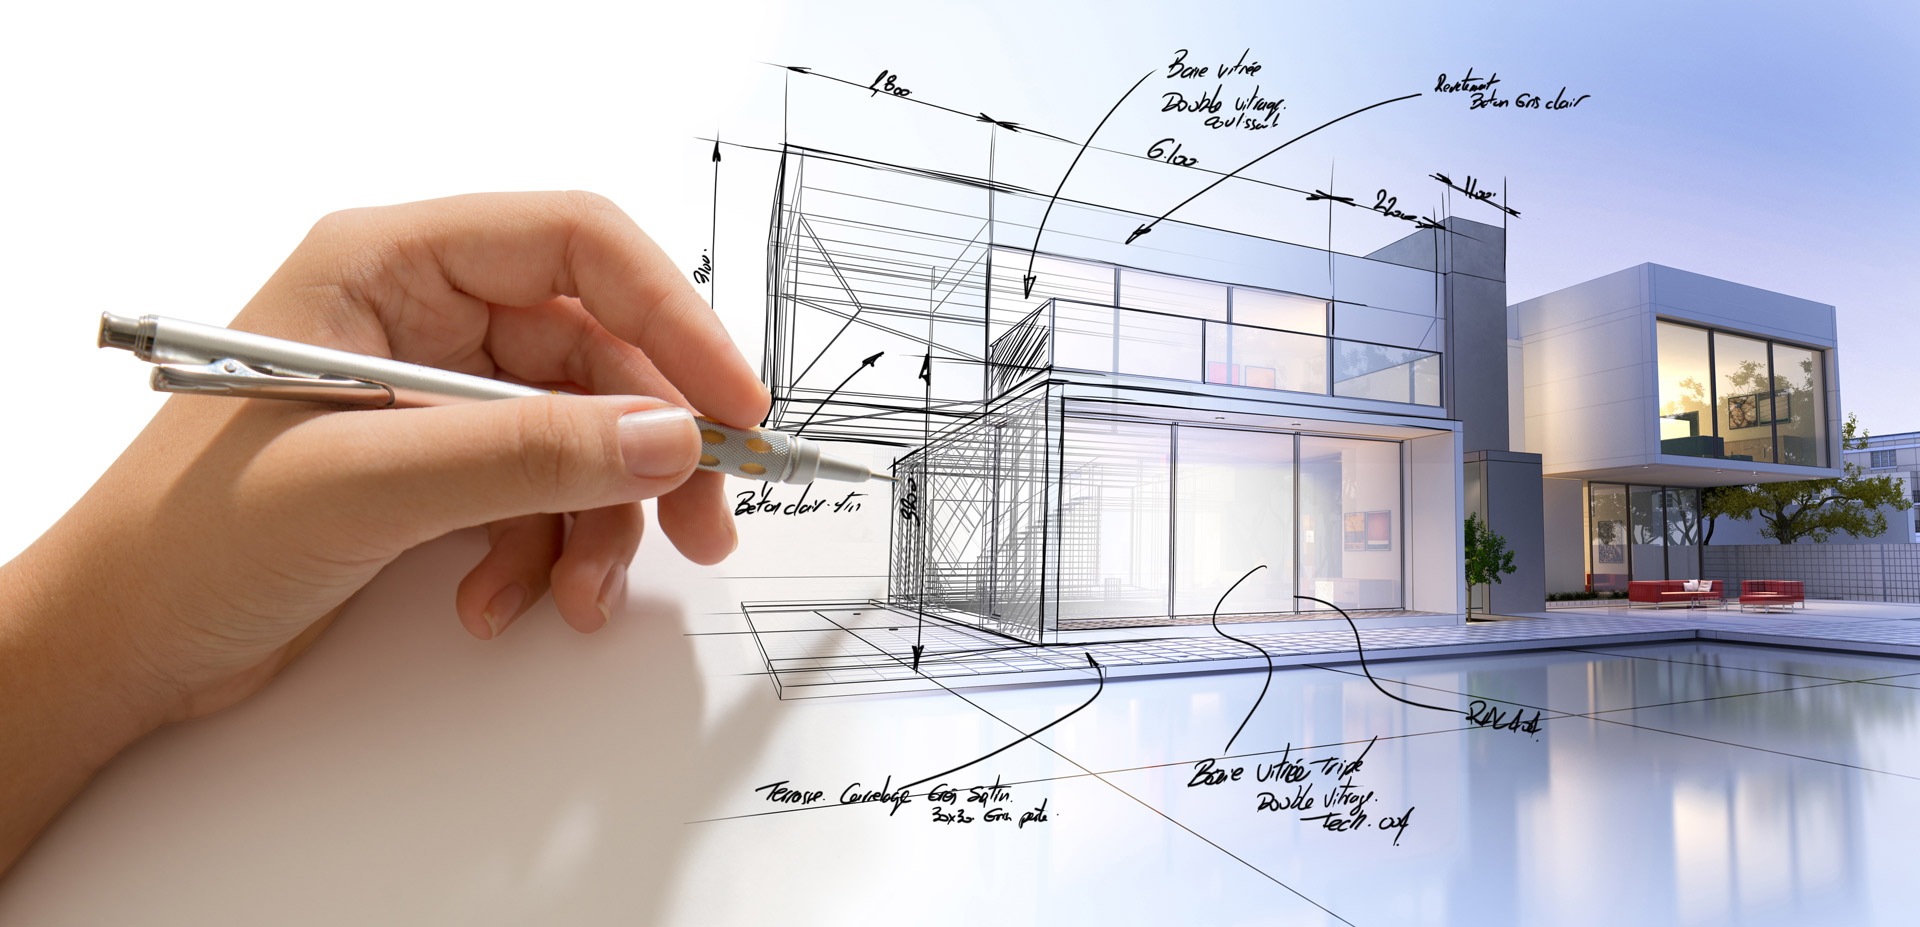 studio-sdl-servizi-immobiliari